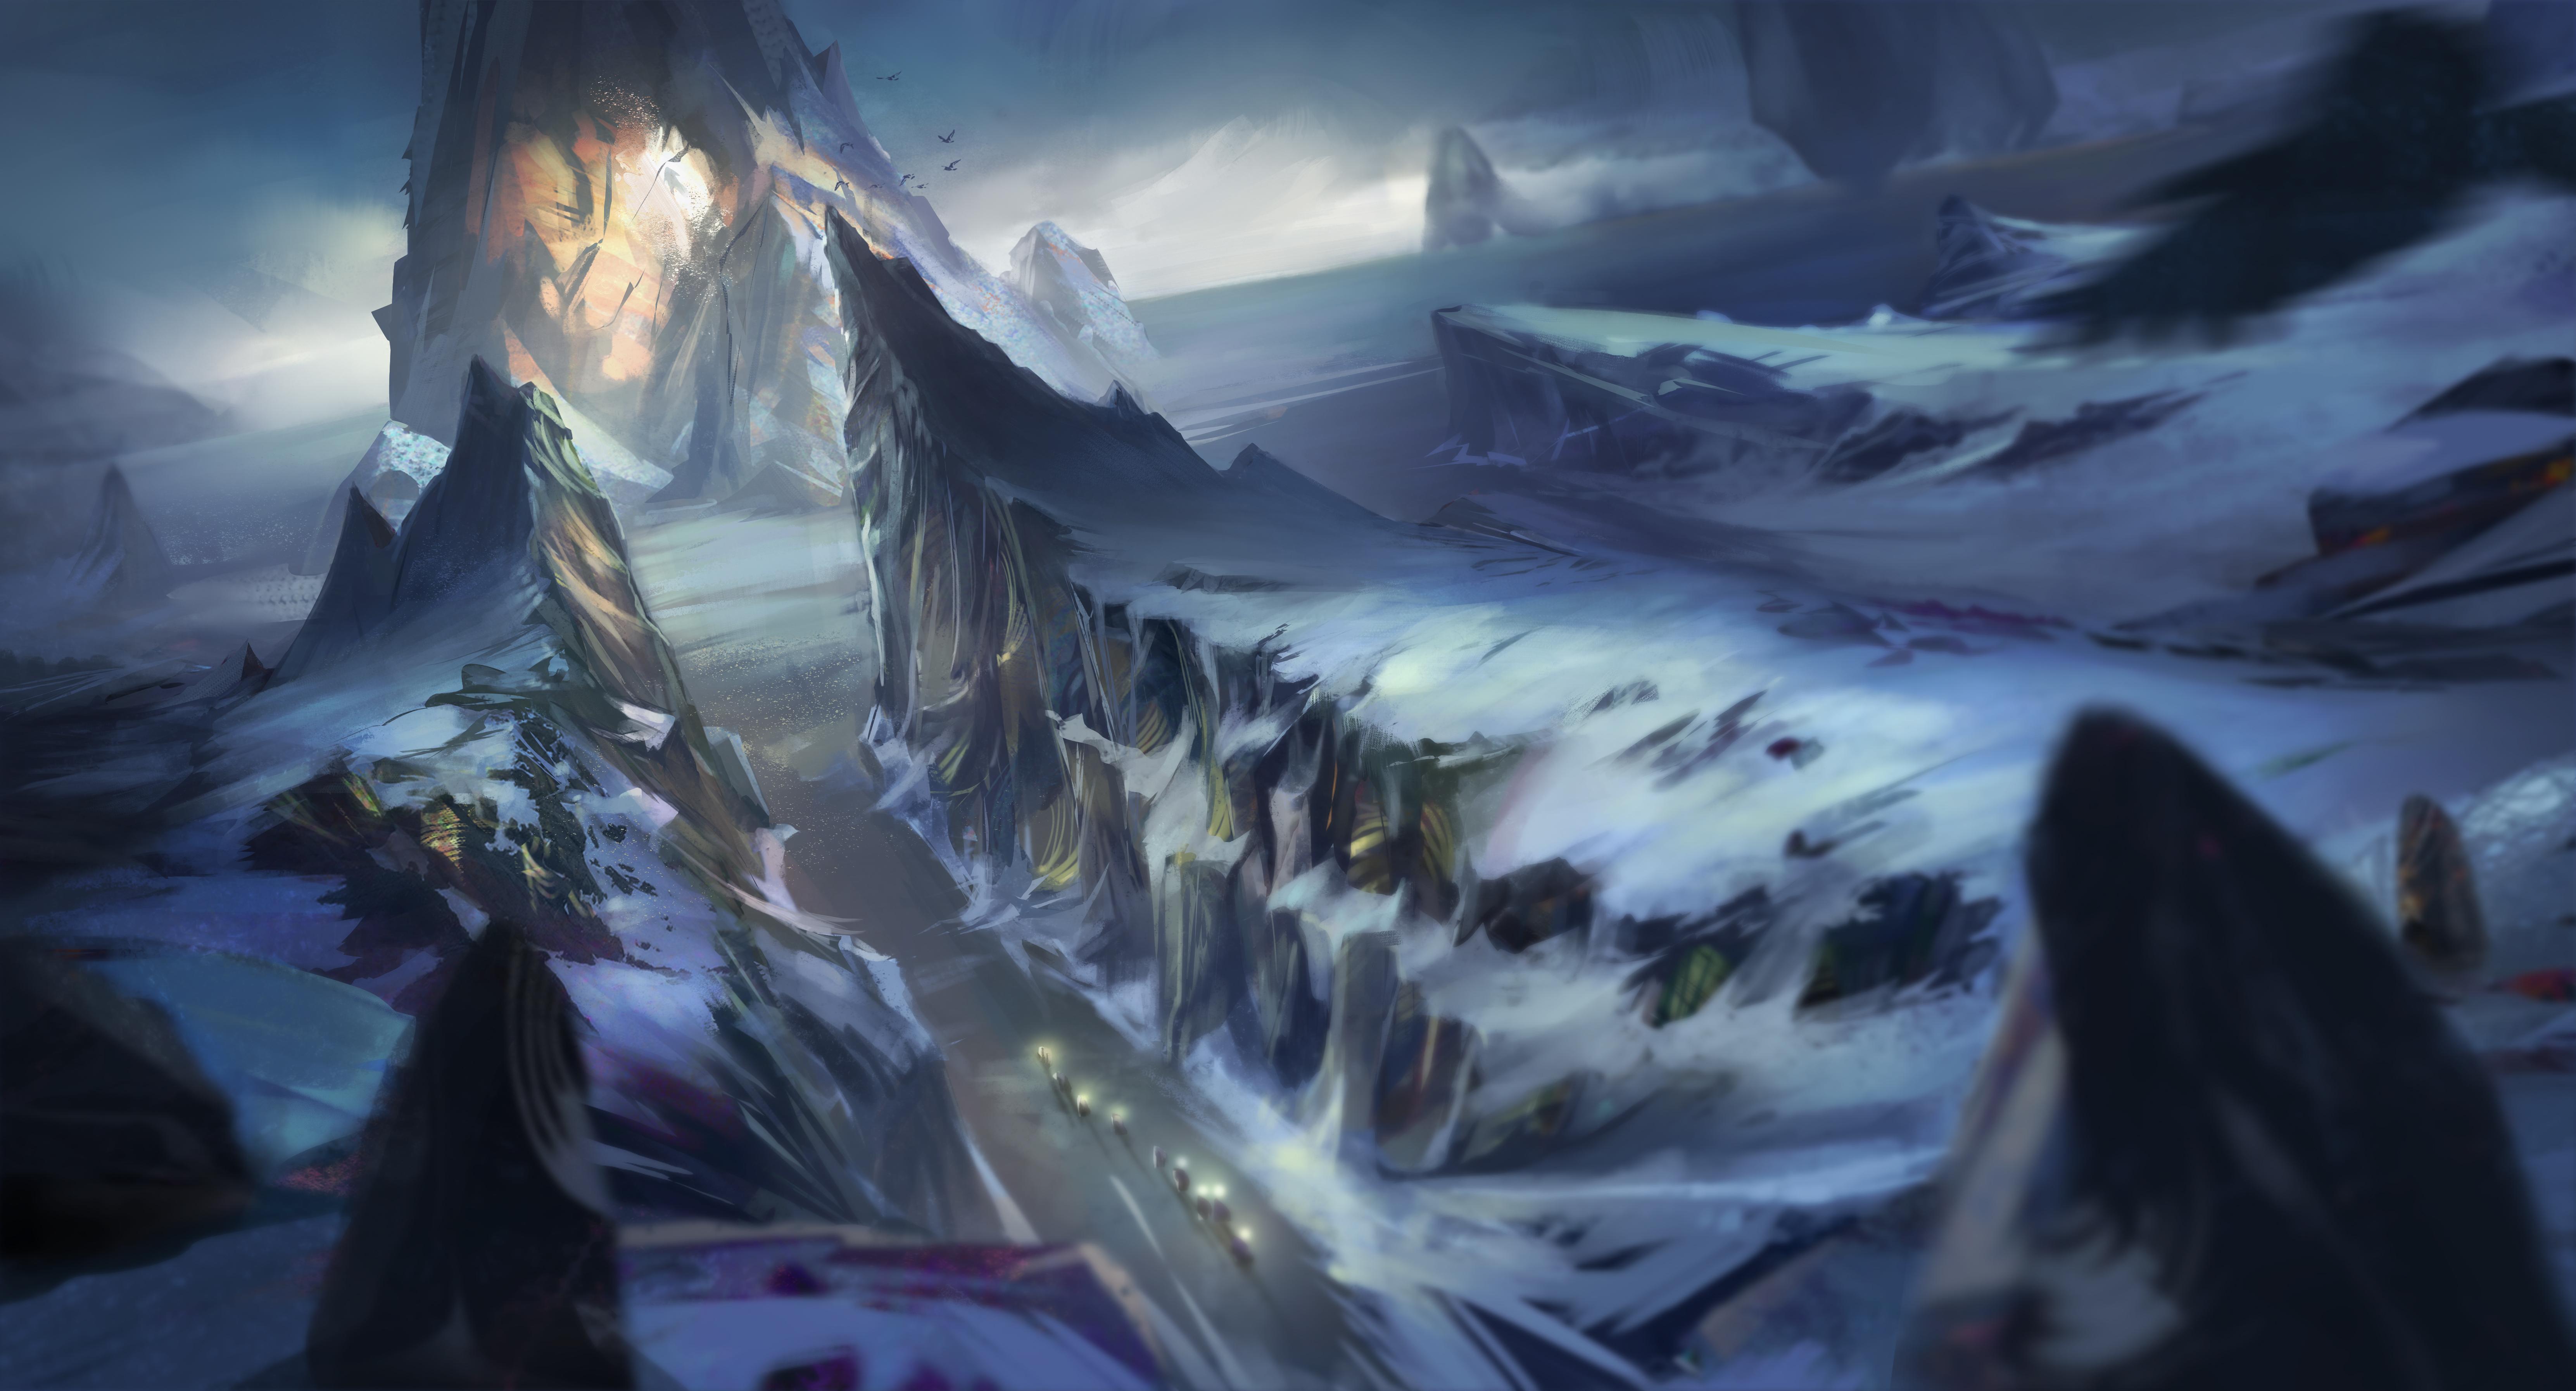 Snow Obsidian